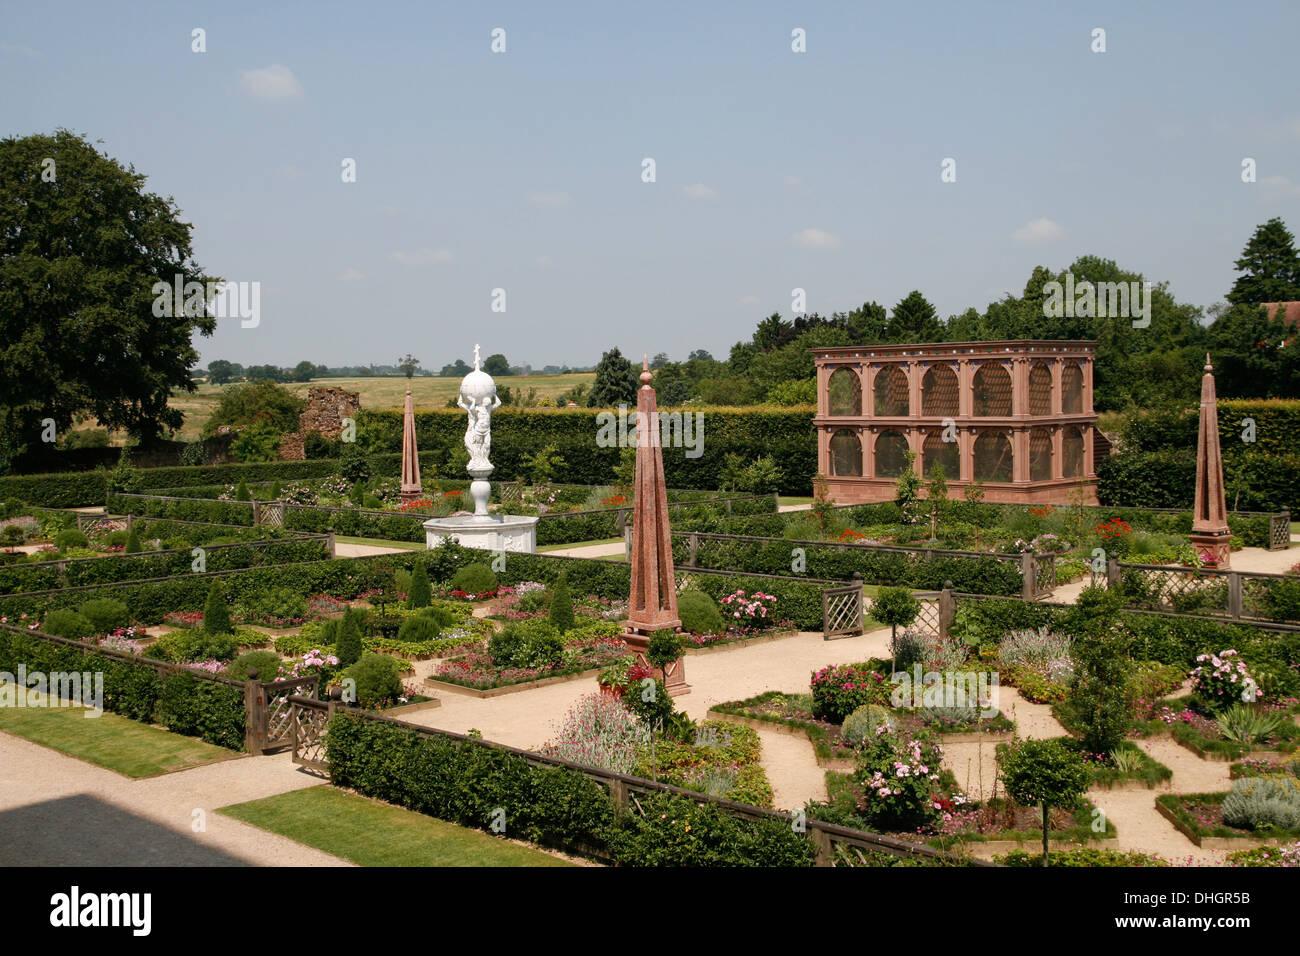 Elizabethan Garden Kenilworth Castle EH Warwickshire England UK - Stock Image